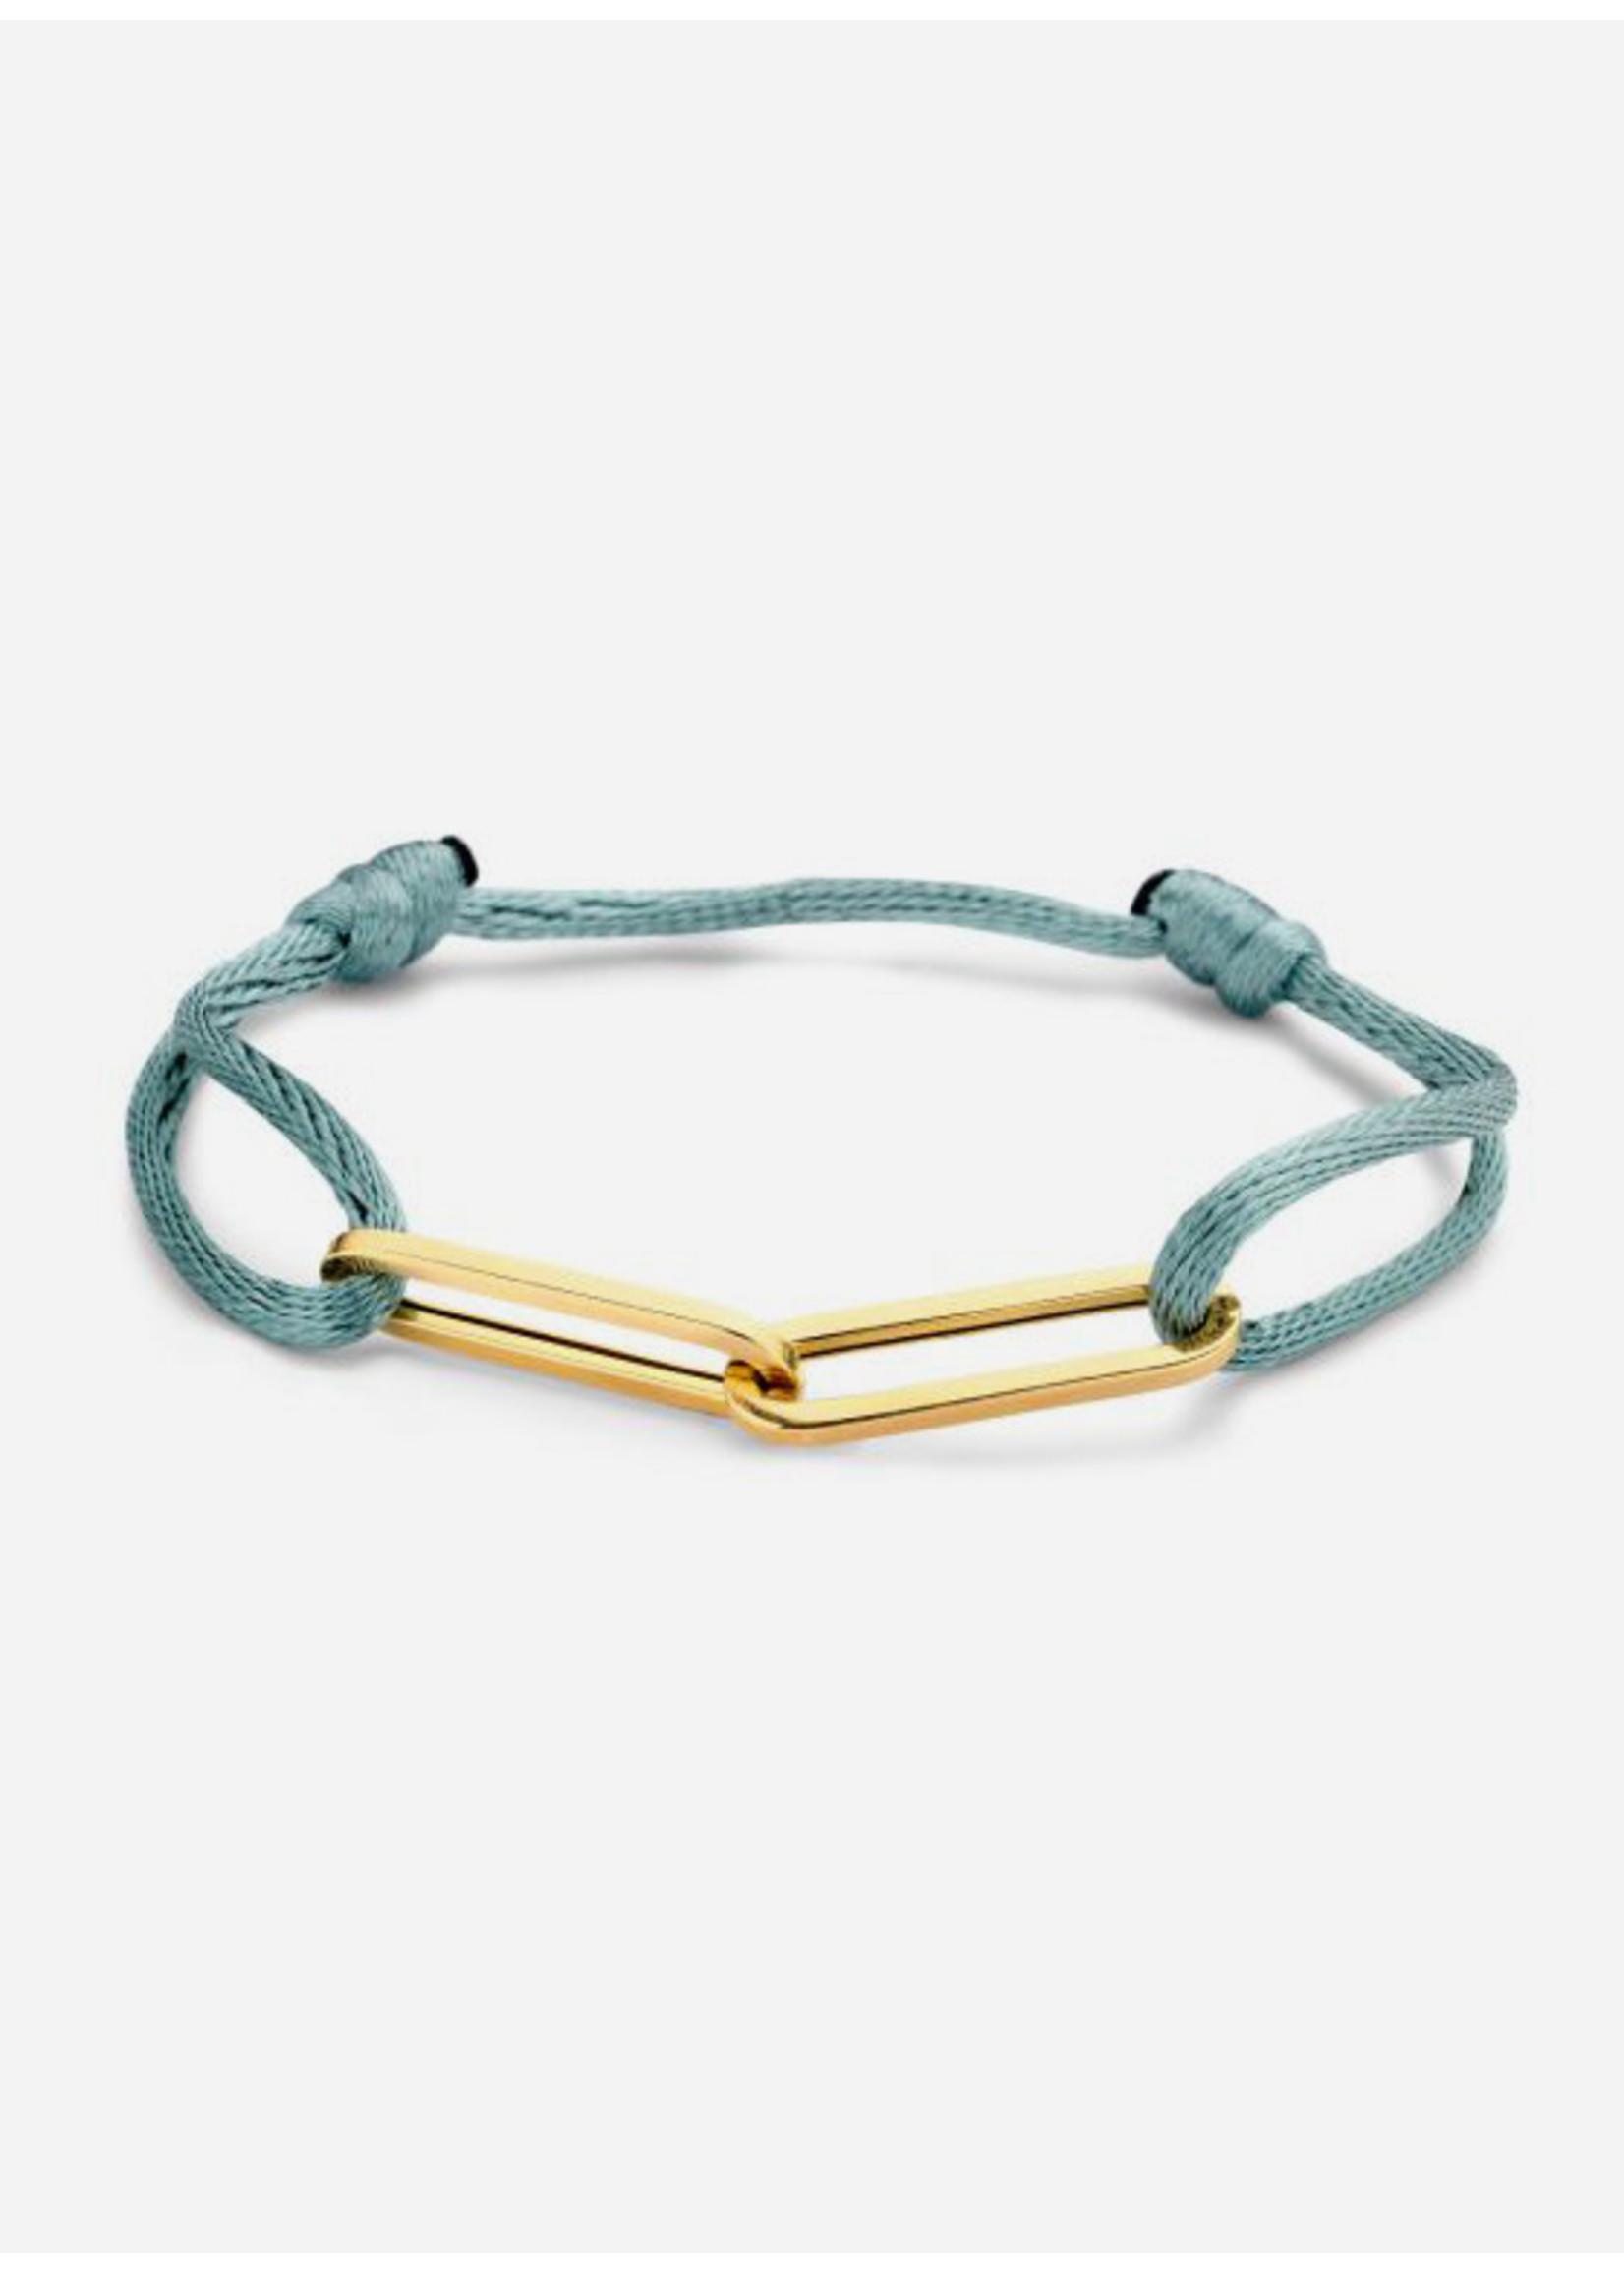 Just Franky Charm bracelet 2 links